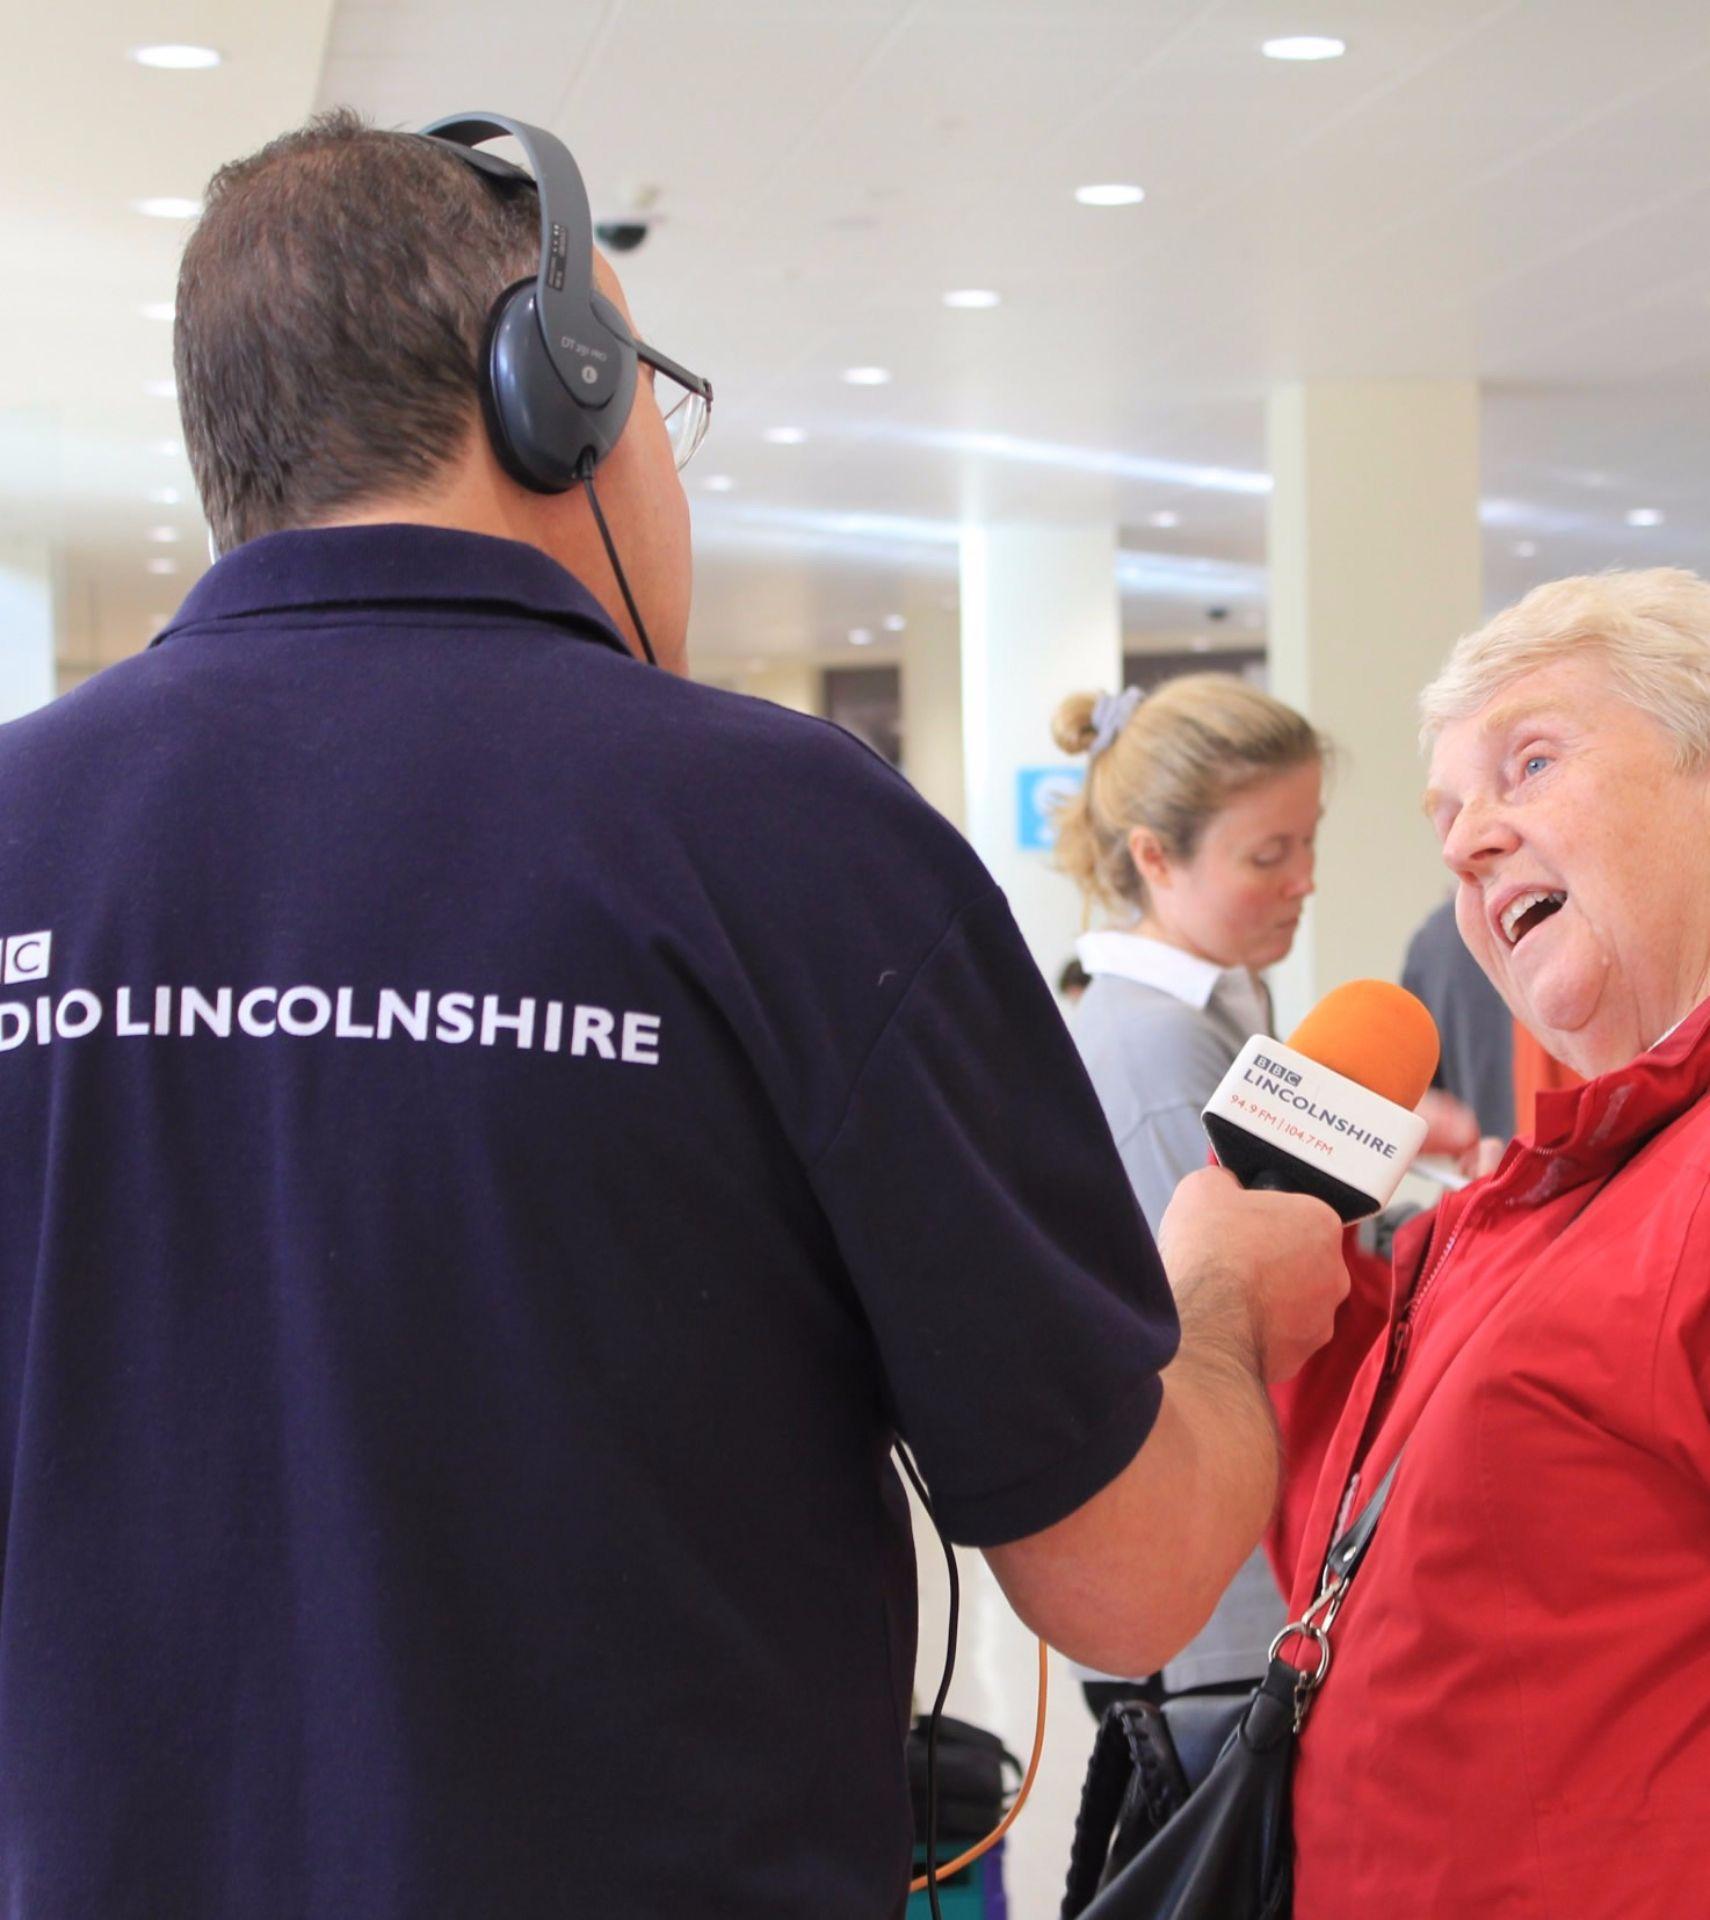 http://wearelava.co.uk/wp-content/uploads/2016/06/Waterside_BBC_Radio_Lincolnshire_Interview.jpg